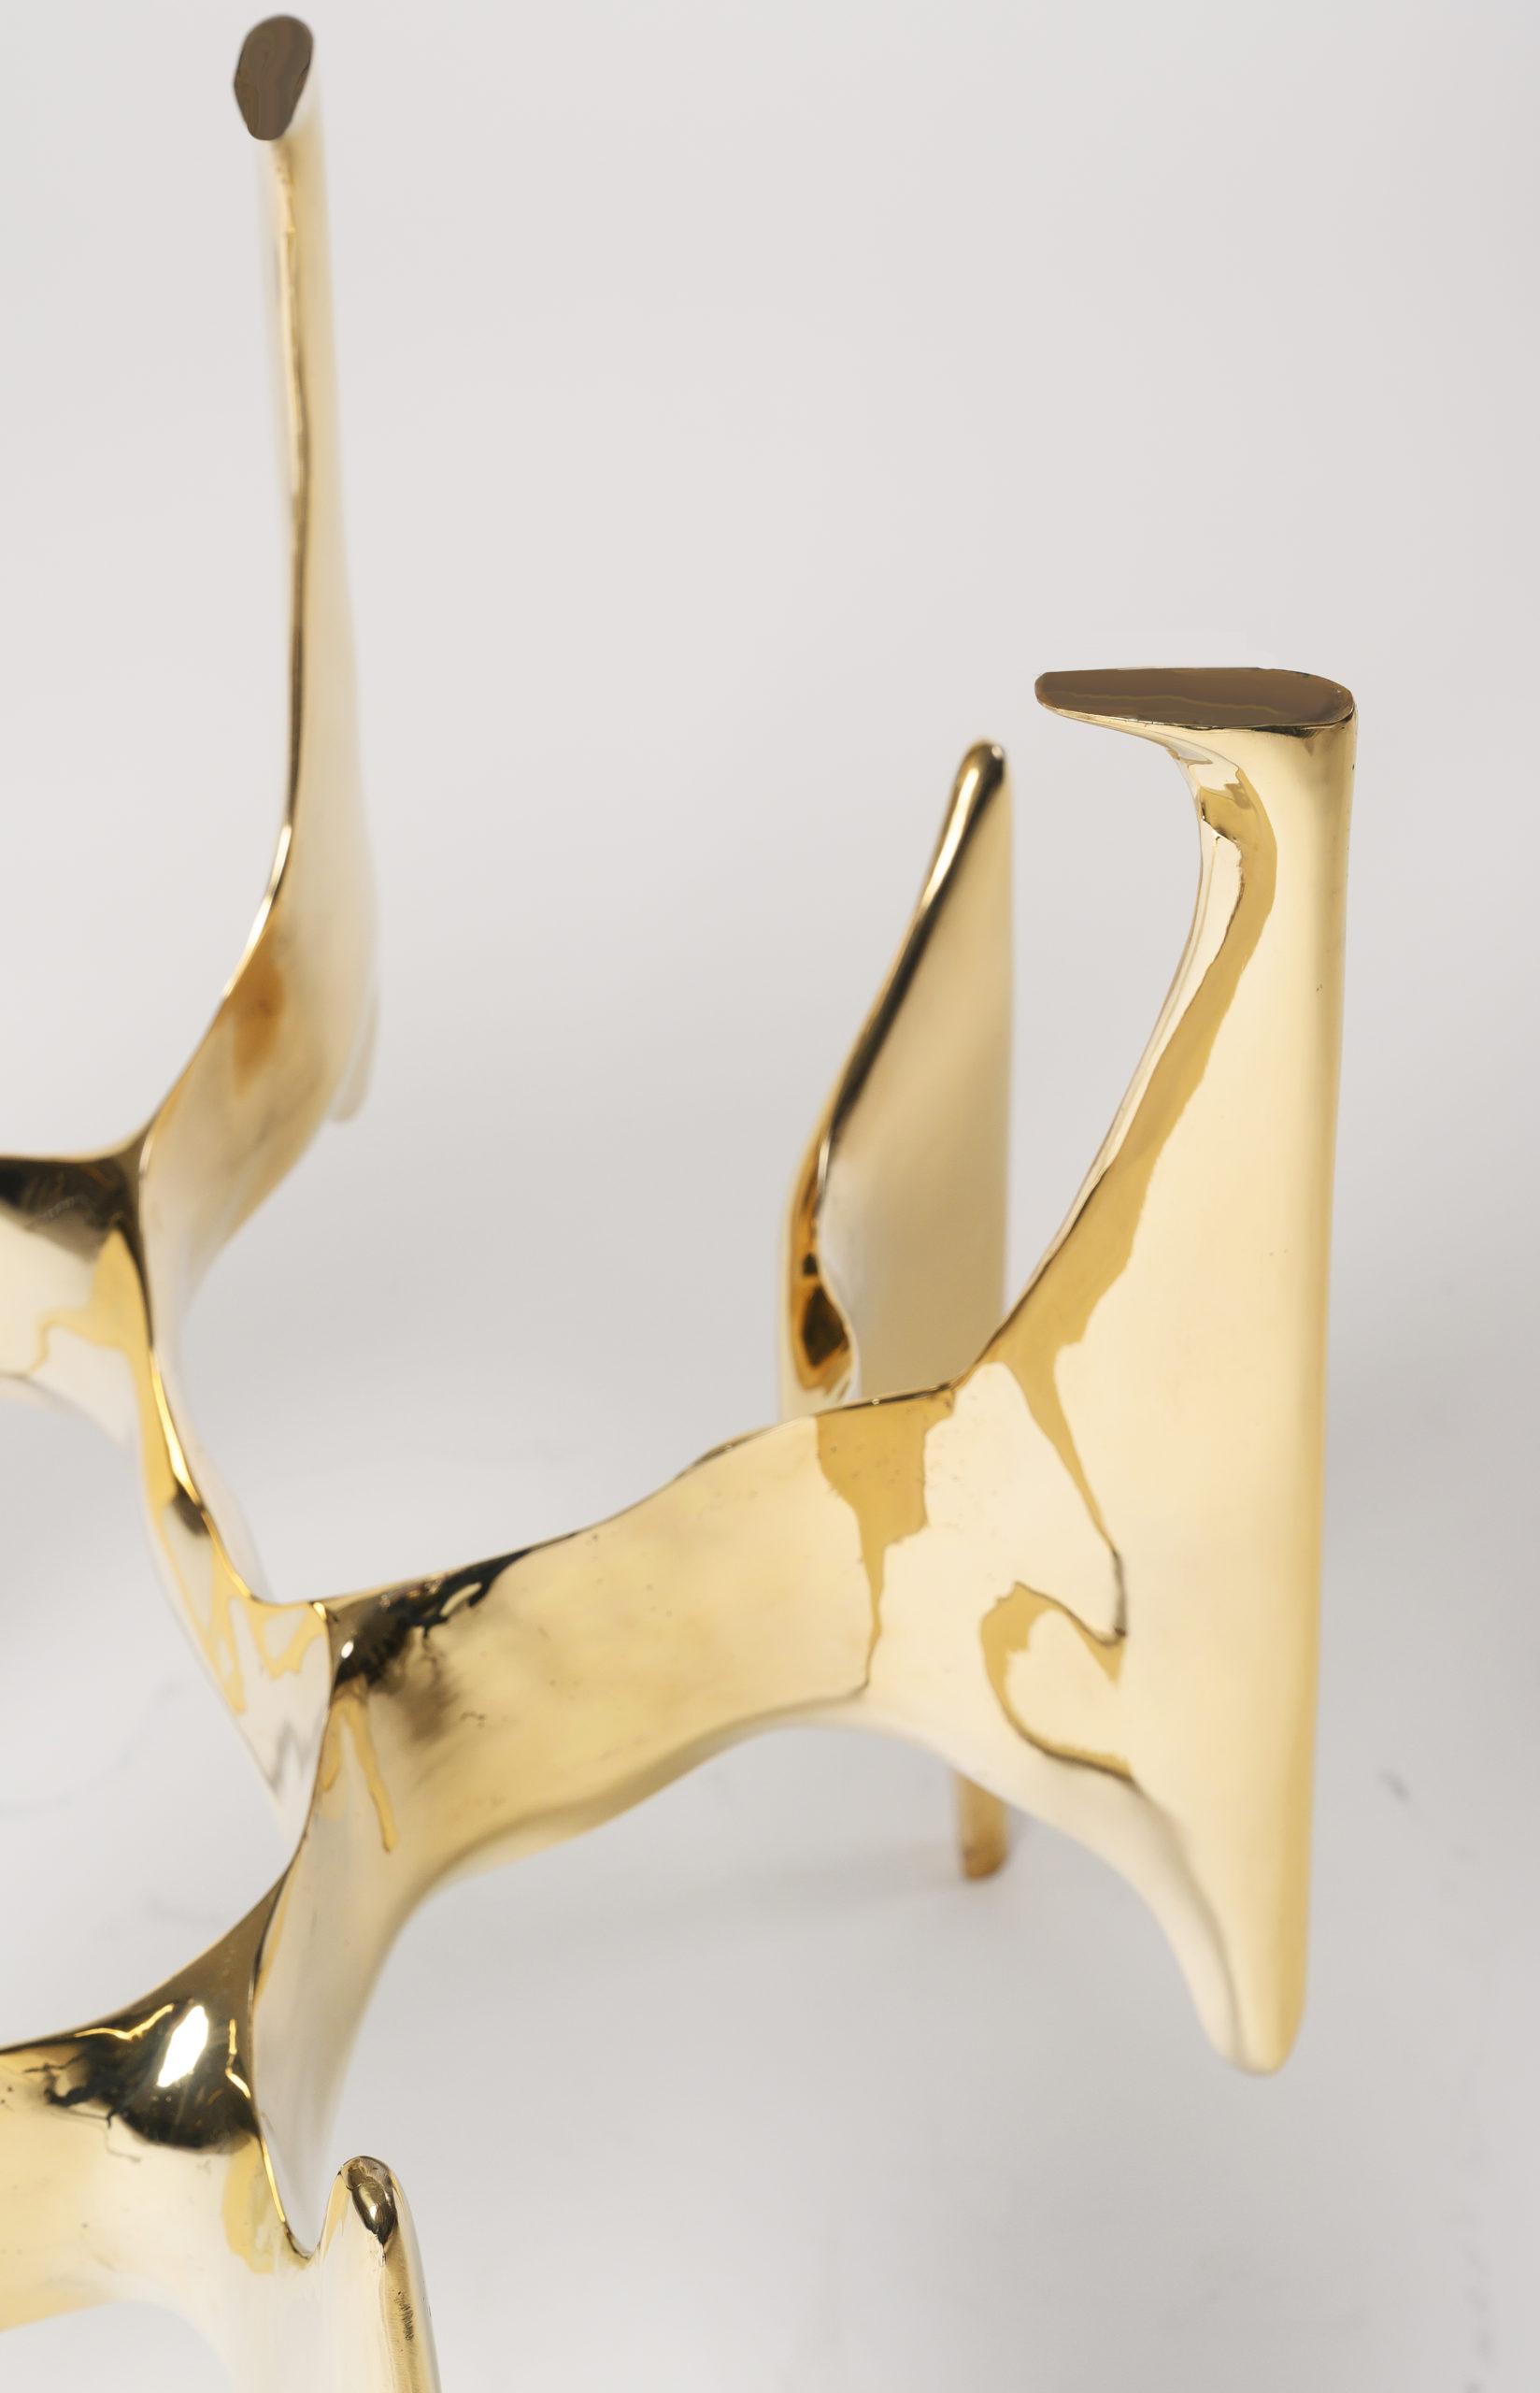 NYDC_WNWN_products_david_sutherland_elan_atelier_ella_table_BEE_5265